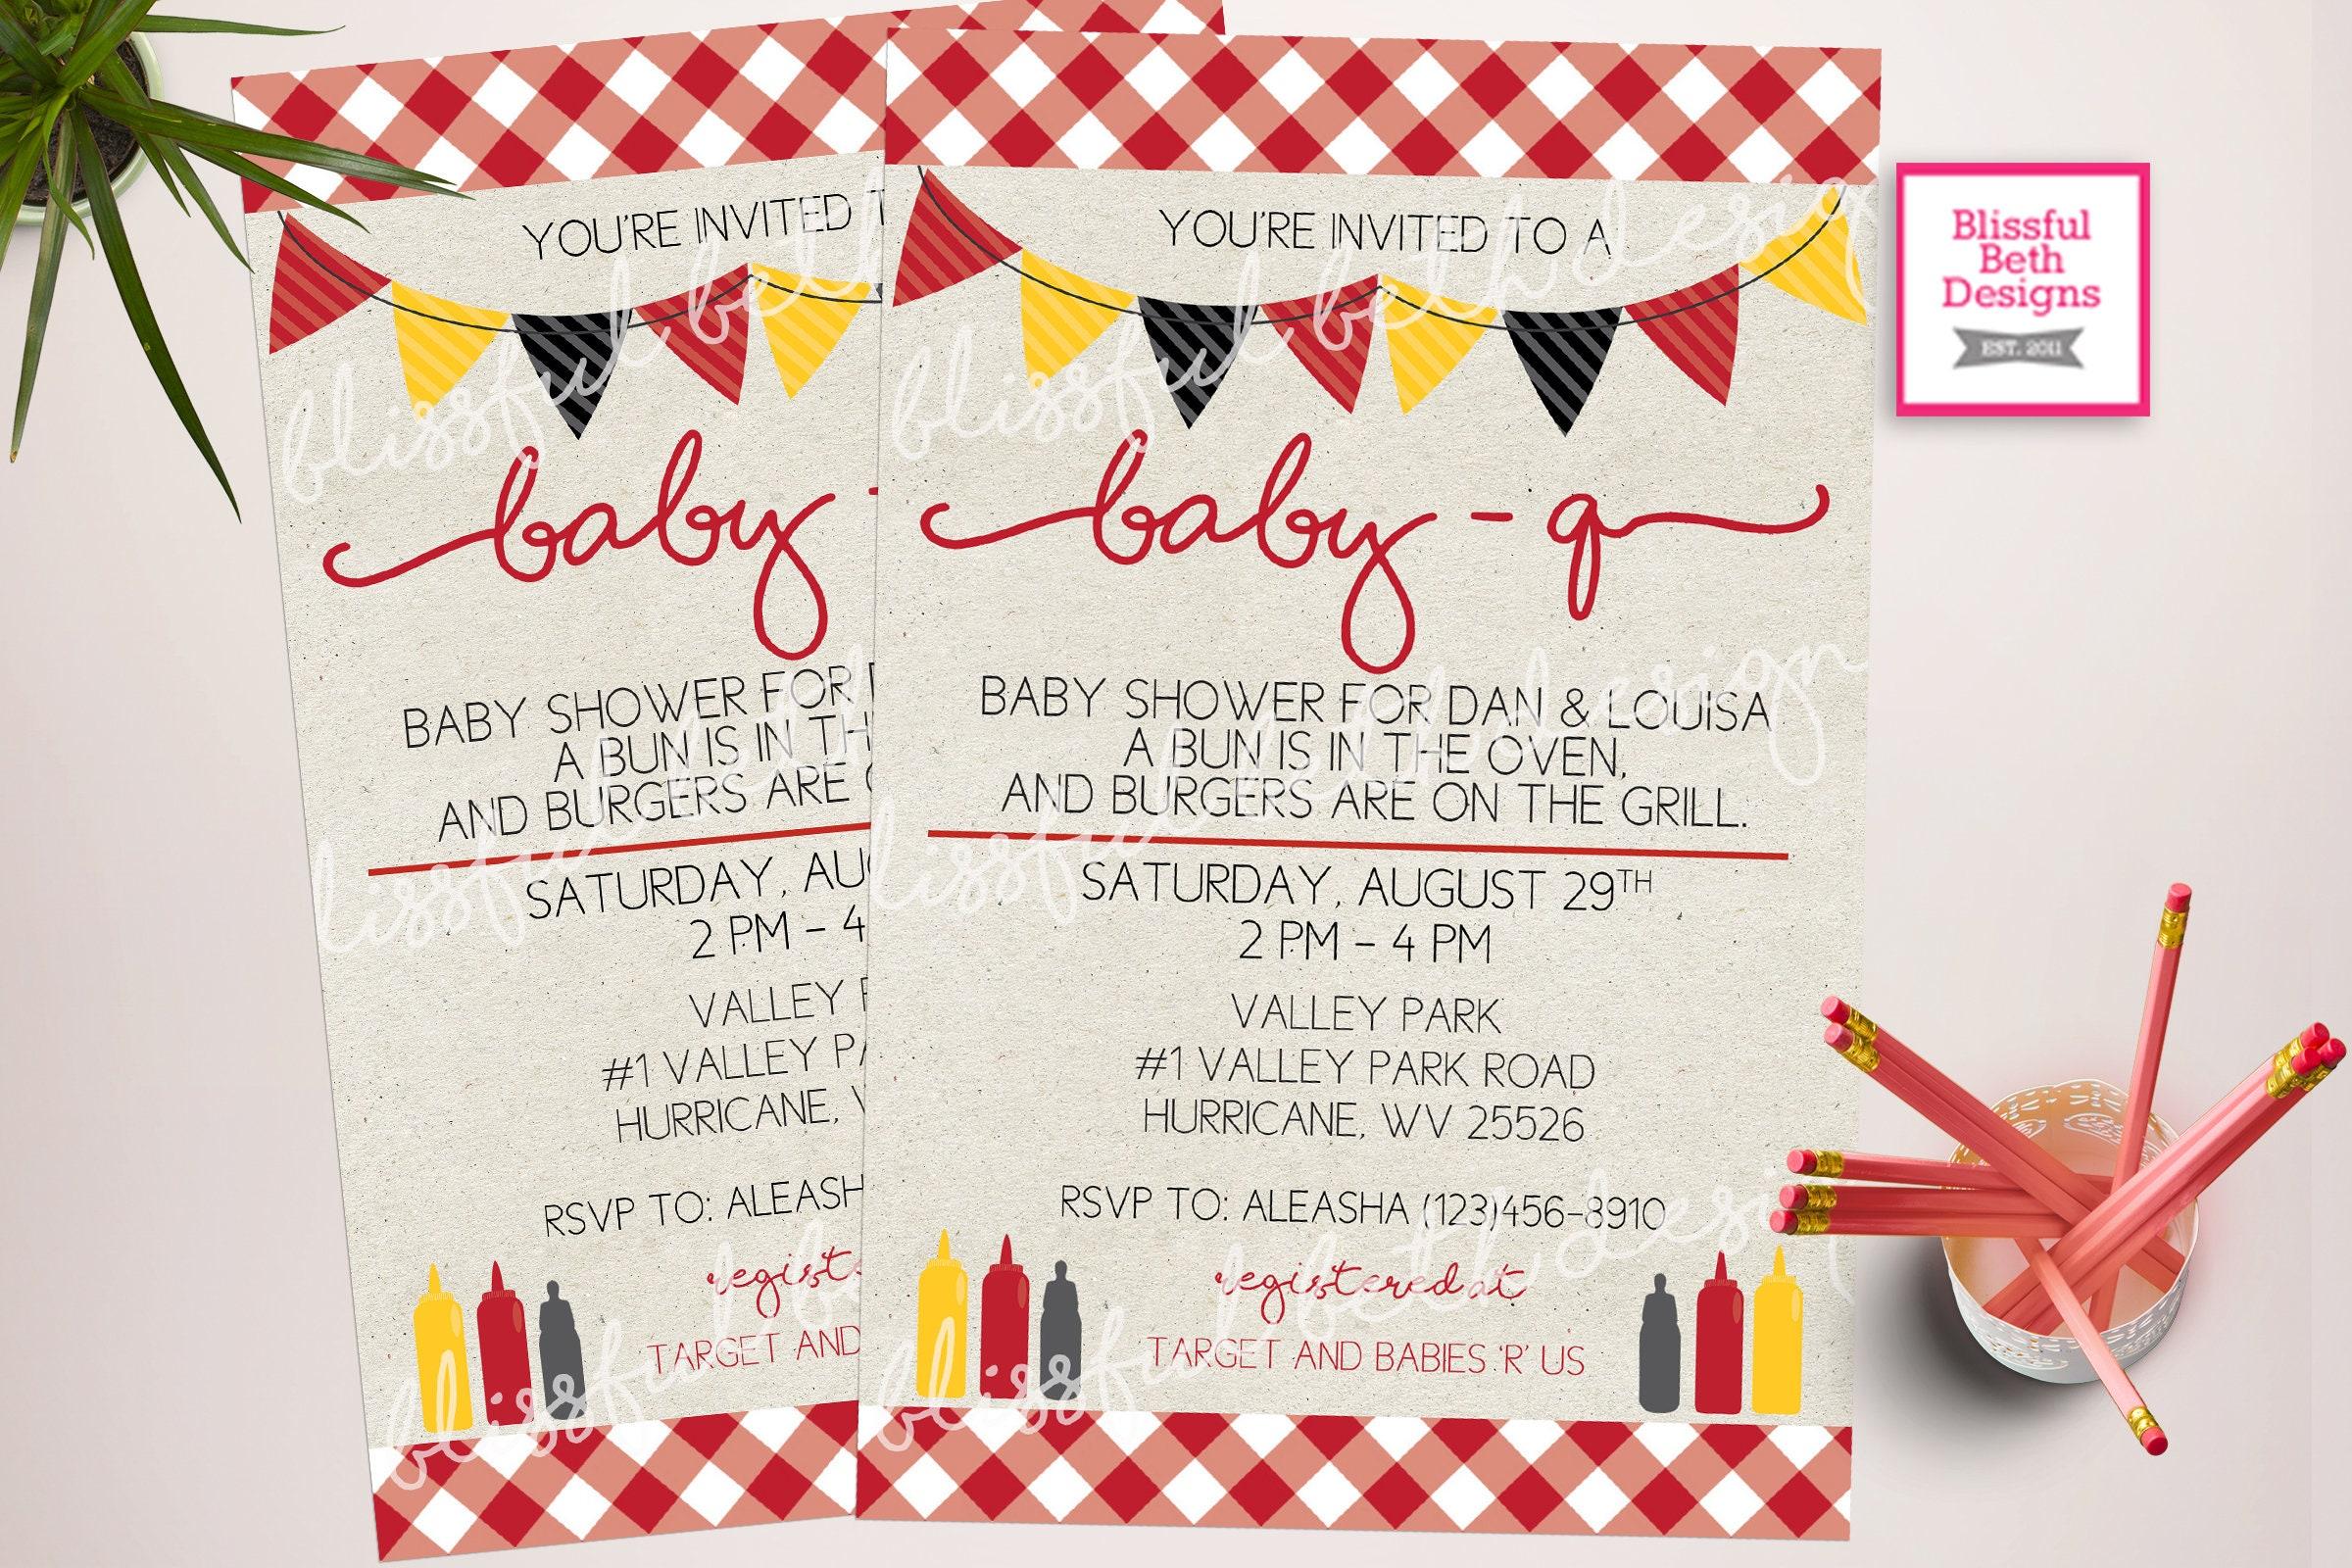 BABY-Q Shower Invitation, Baby bbq shower, bbq shower, backyard bbq ...